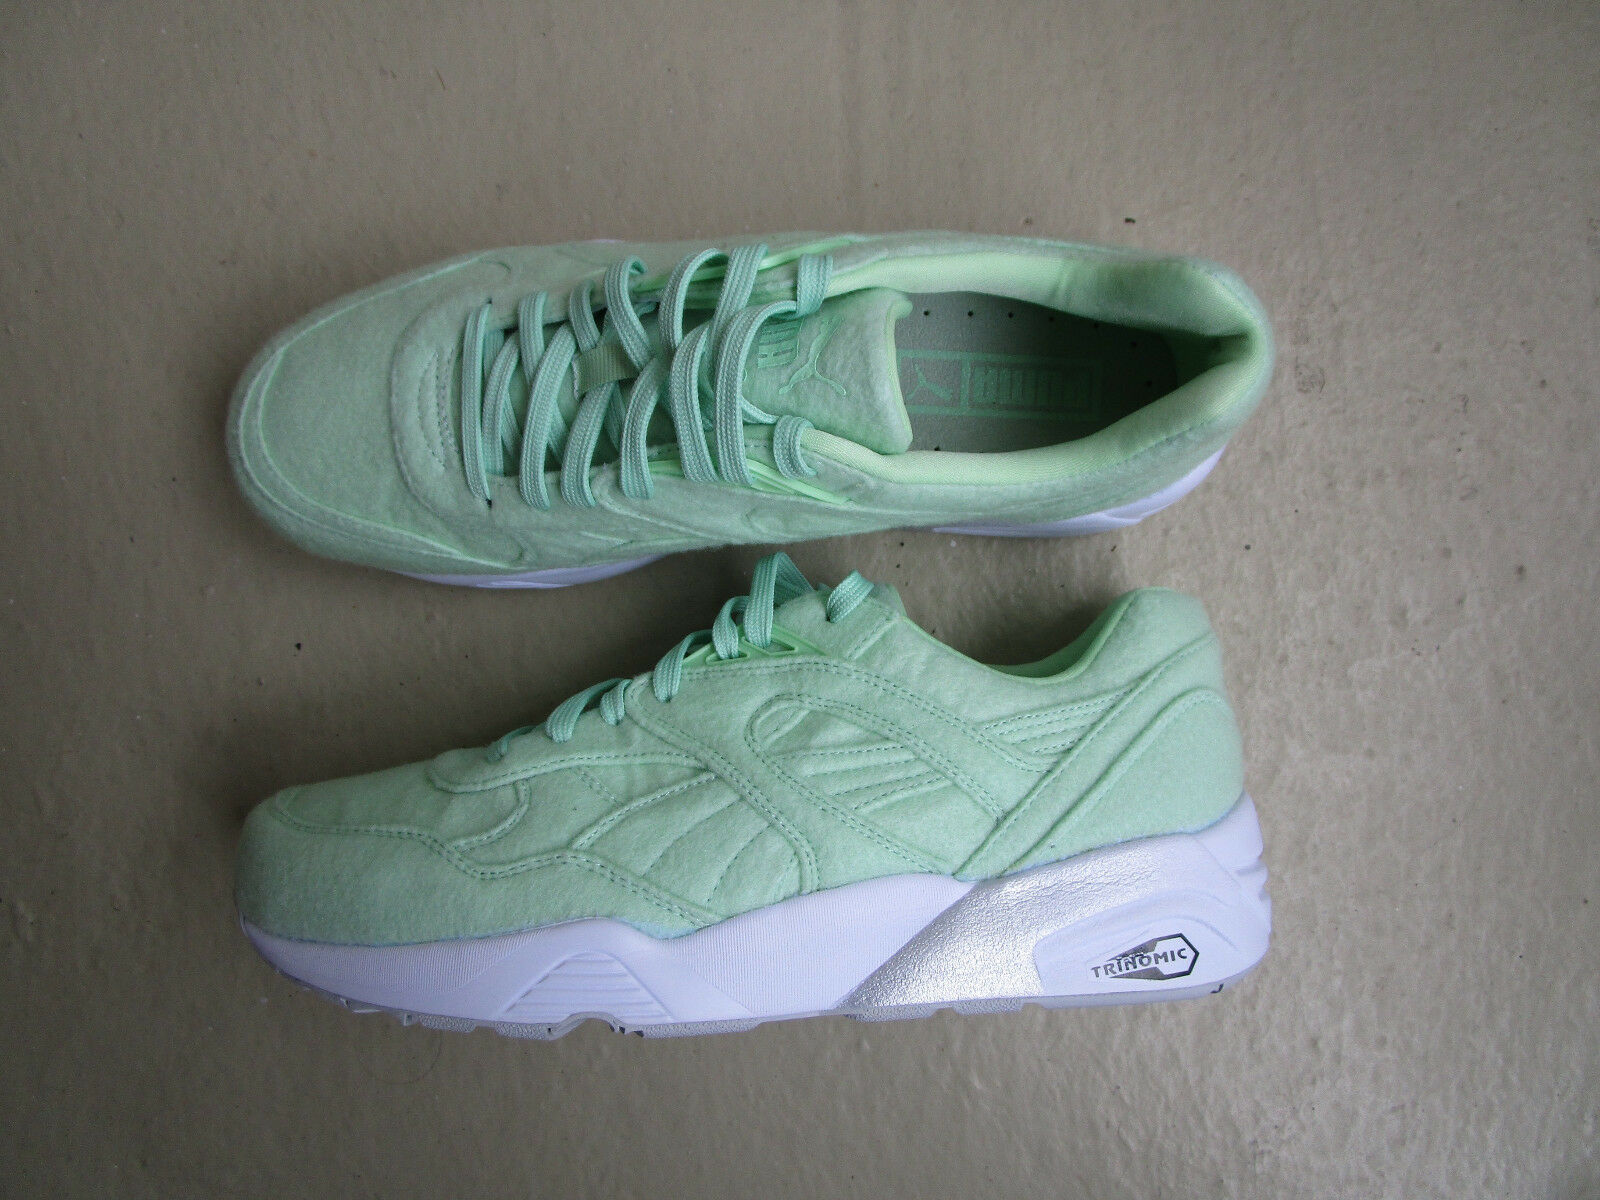 Puma R698 Bright 45 Mint Green White